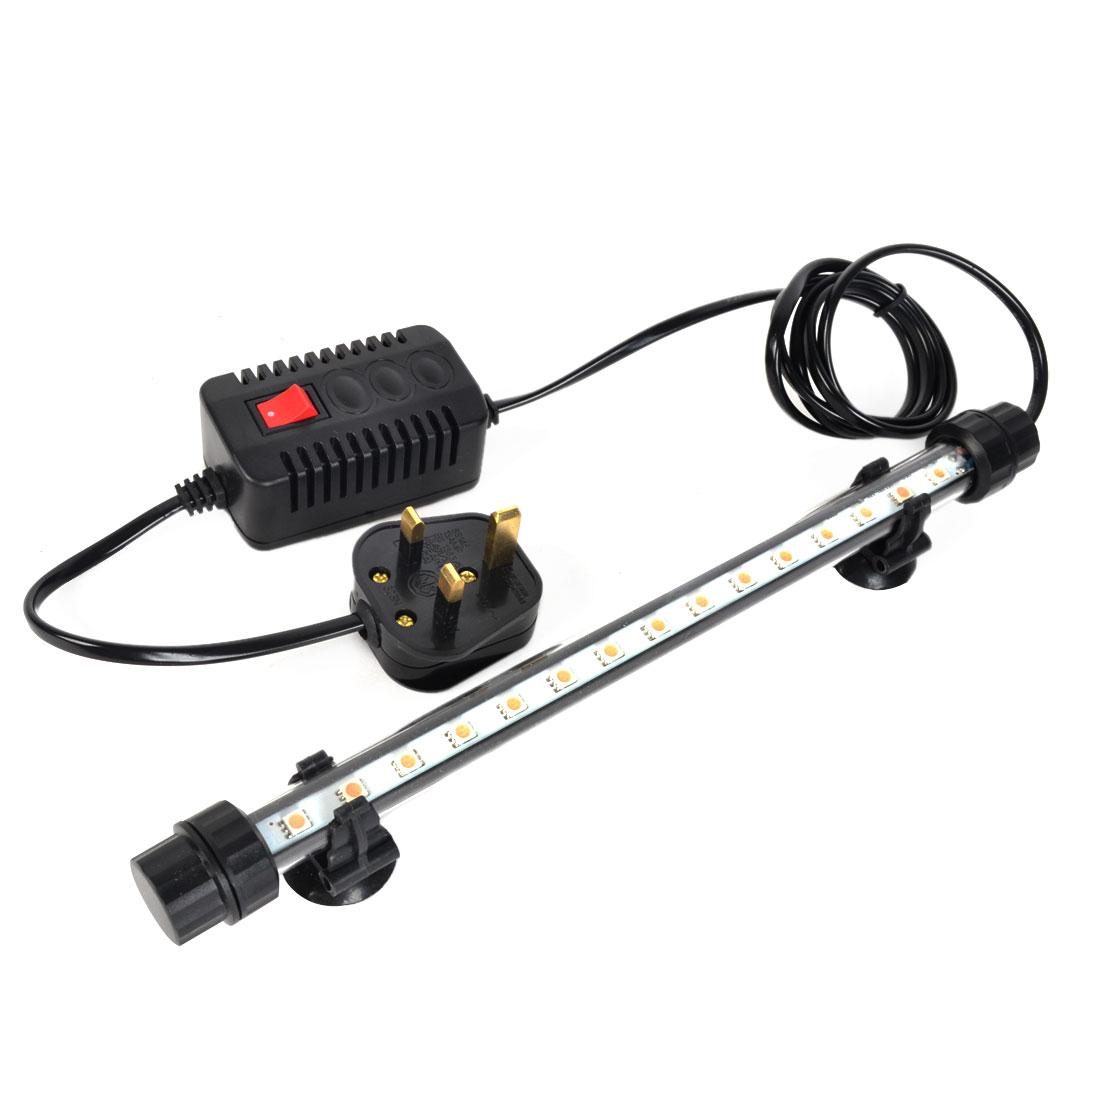 UK Plug AC 220V-240V 15x0.5W Pink Light LED Fish Tank Underwater Submersible Lamp